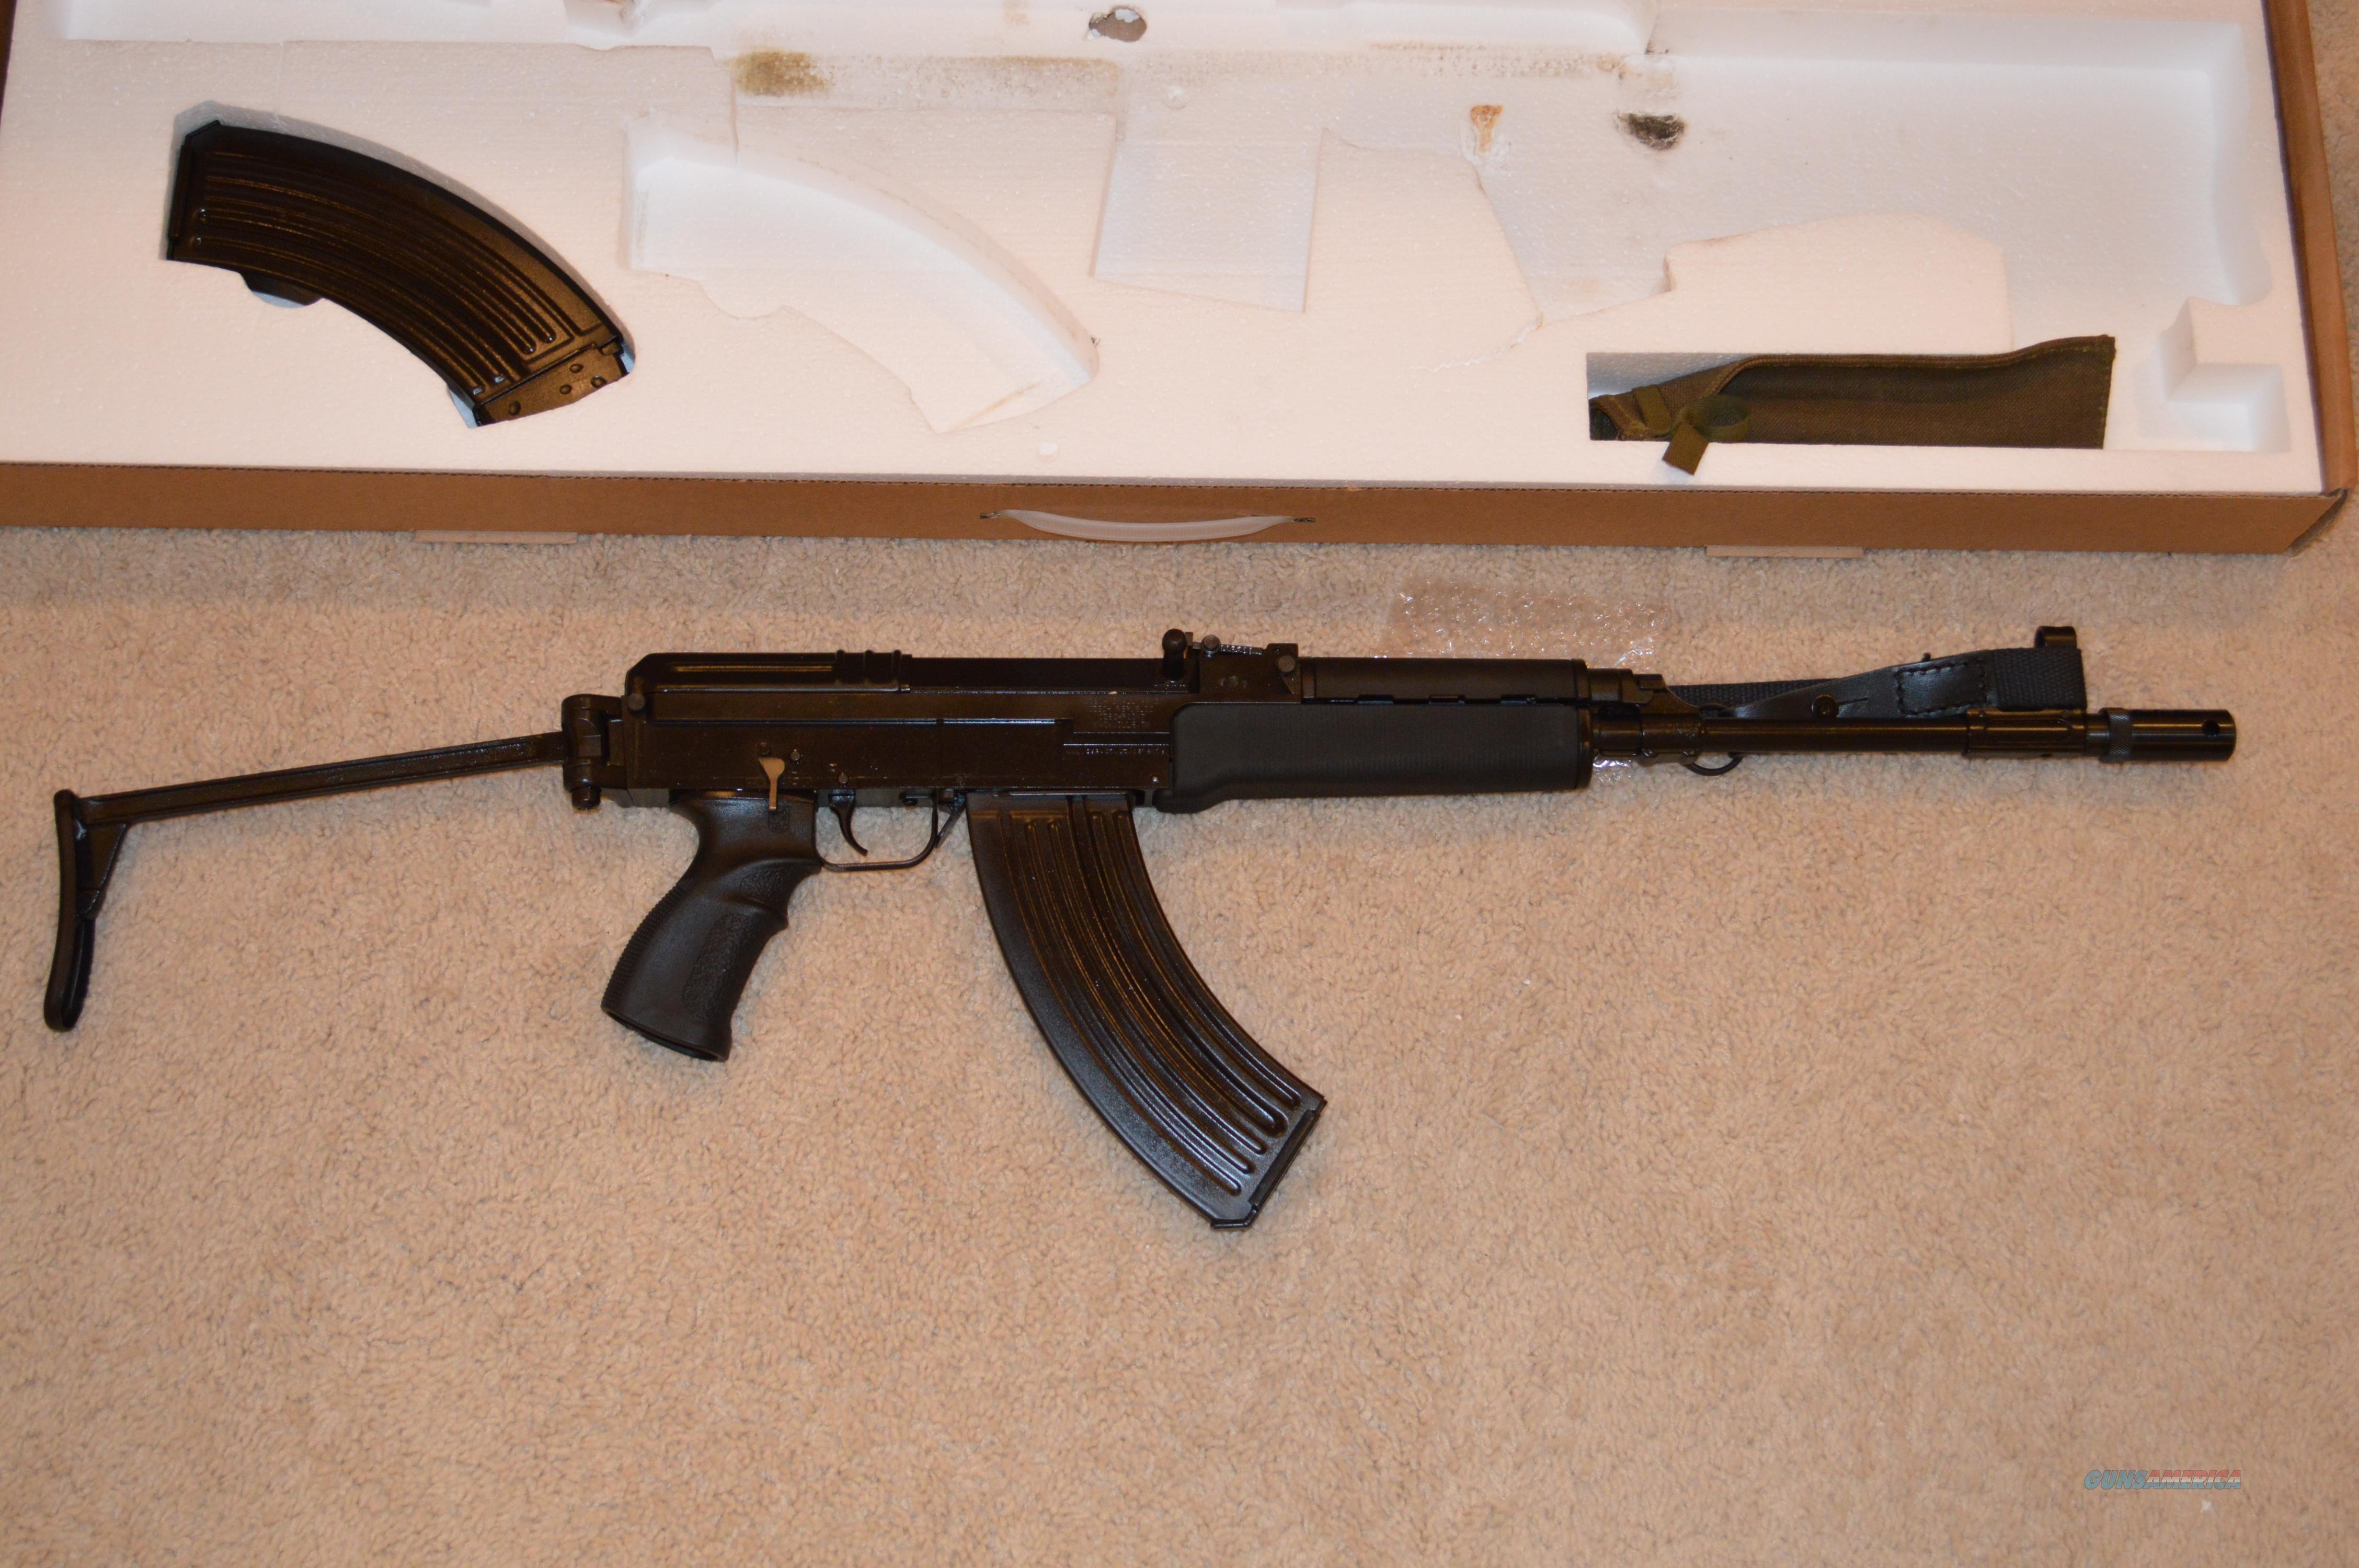 Czechpoint VZ-58 Military Folder Milled Receiver VZ58 Not AK-47